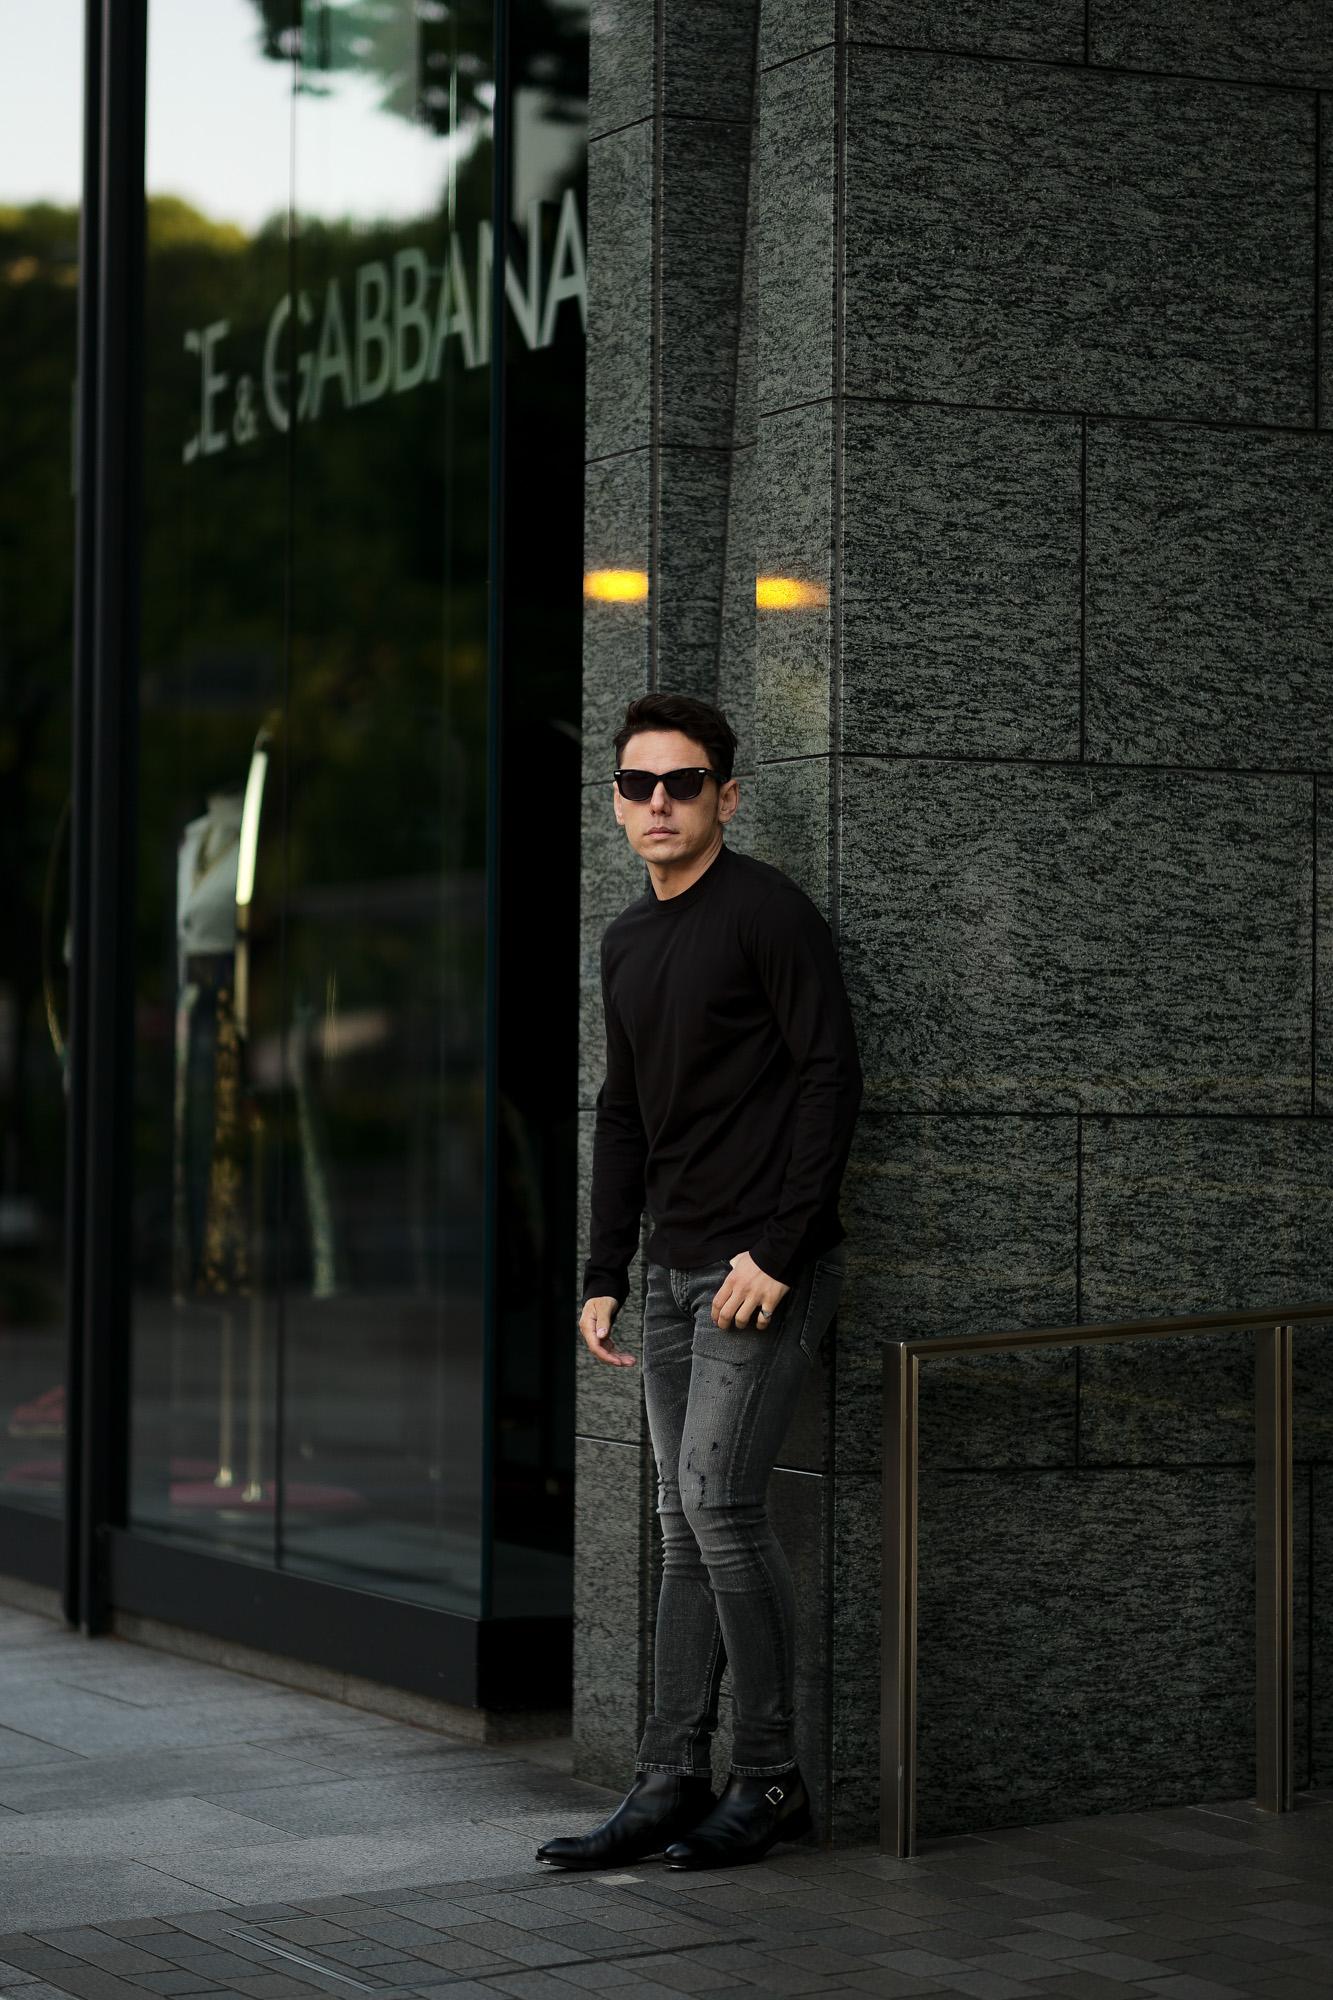 FEDELI (フェデリ) Long Sleeve Crew Neck T-shirt (ロングスリーブ Tシャツ) ギザコットン ロングスリーブ Tシャツ BLACK (ブラック・36) made in italy (イタリア製) 2021春夏新作 愛知 名古屋 Alto e Diritto altoediritto アルトエデリット ロンT